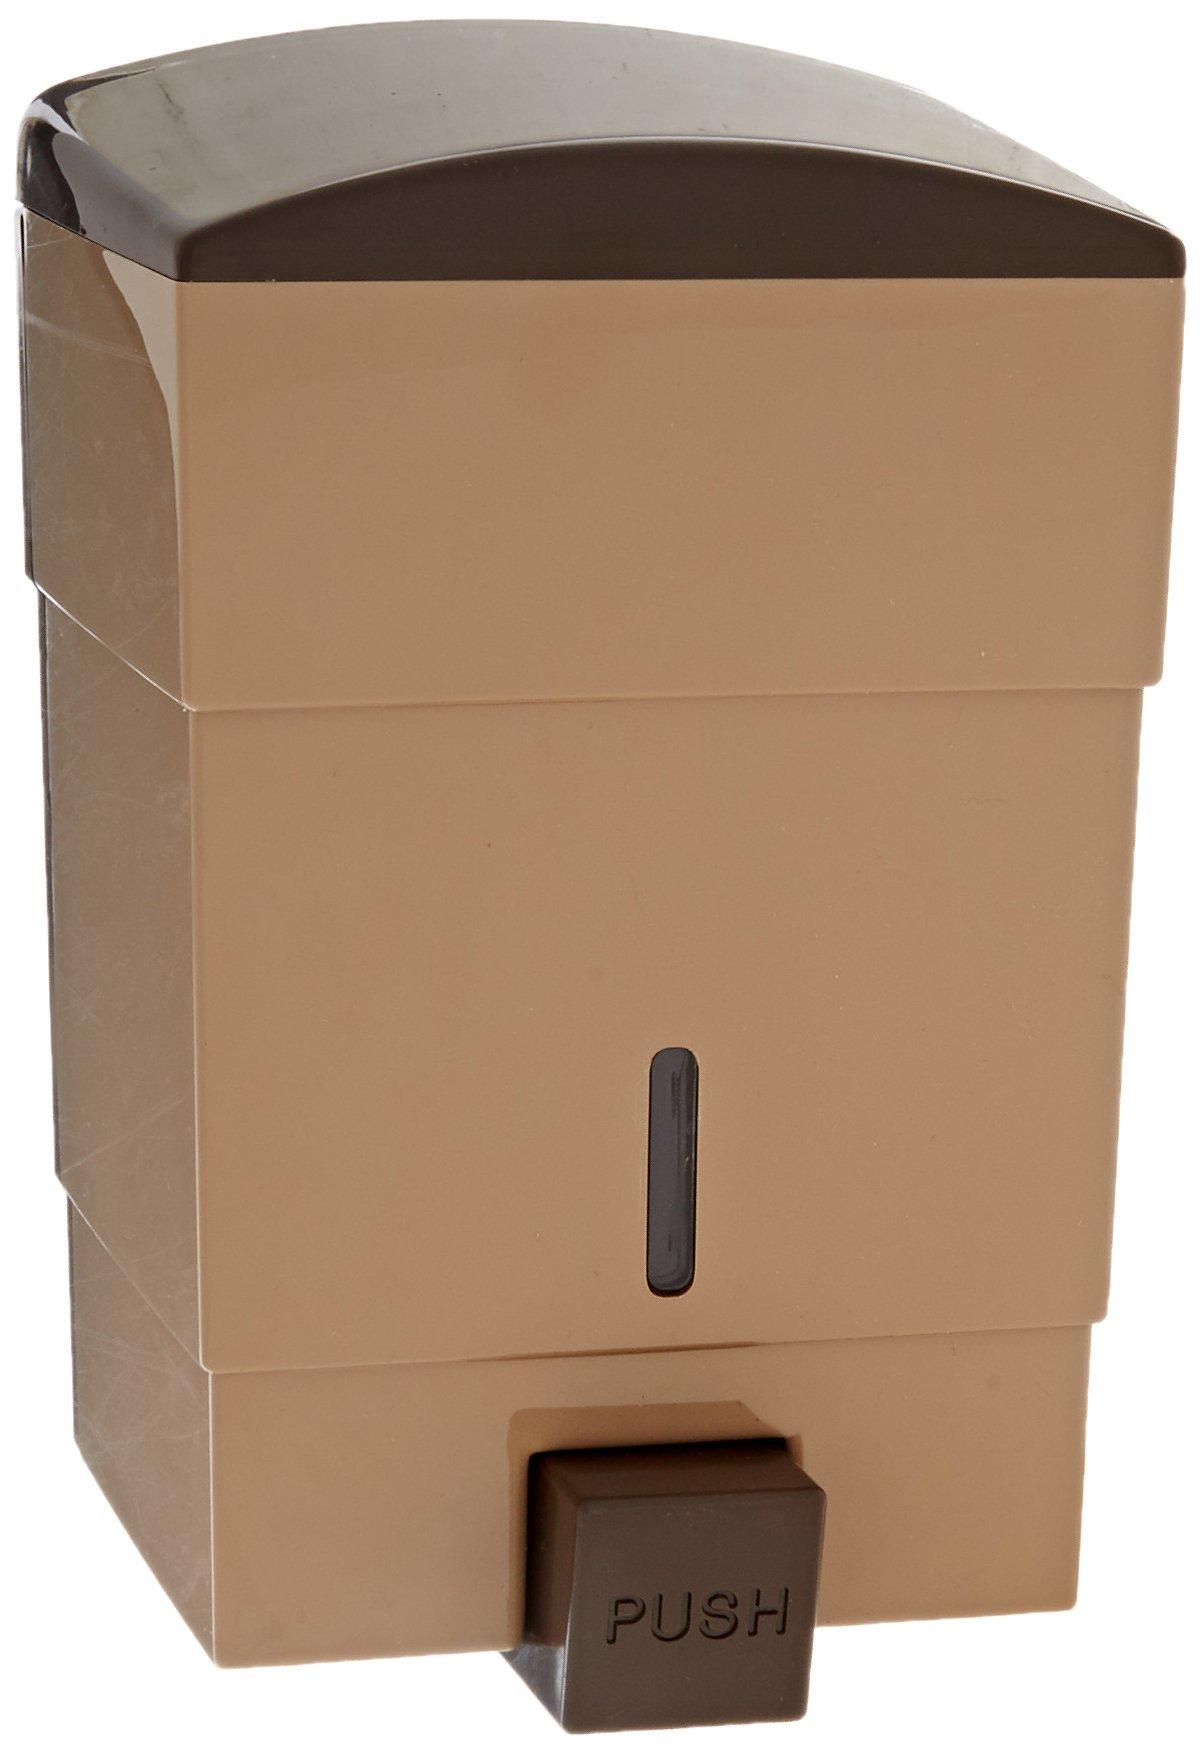 Impact 9350 Triad Soap Dispenser, 50 oz Capacity, 4-1/4'' Length x 4-3/4'' Width x 7-1/2'' Height, Tan (Case of 12)